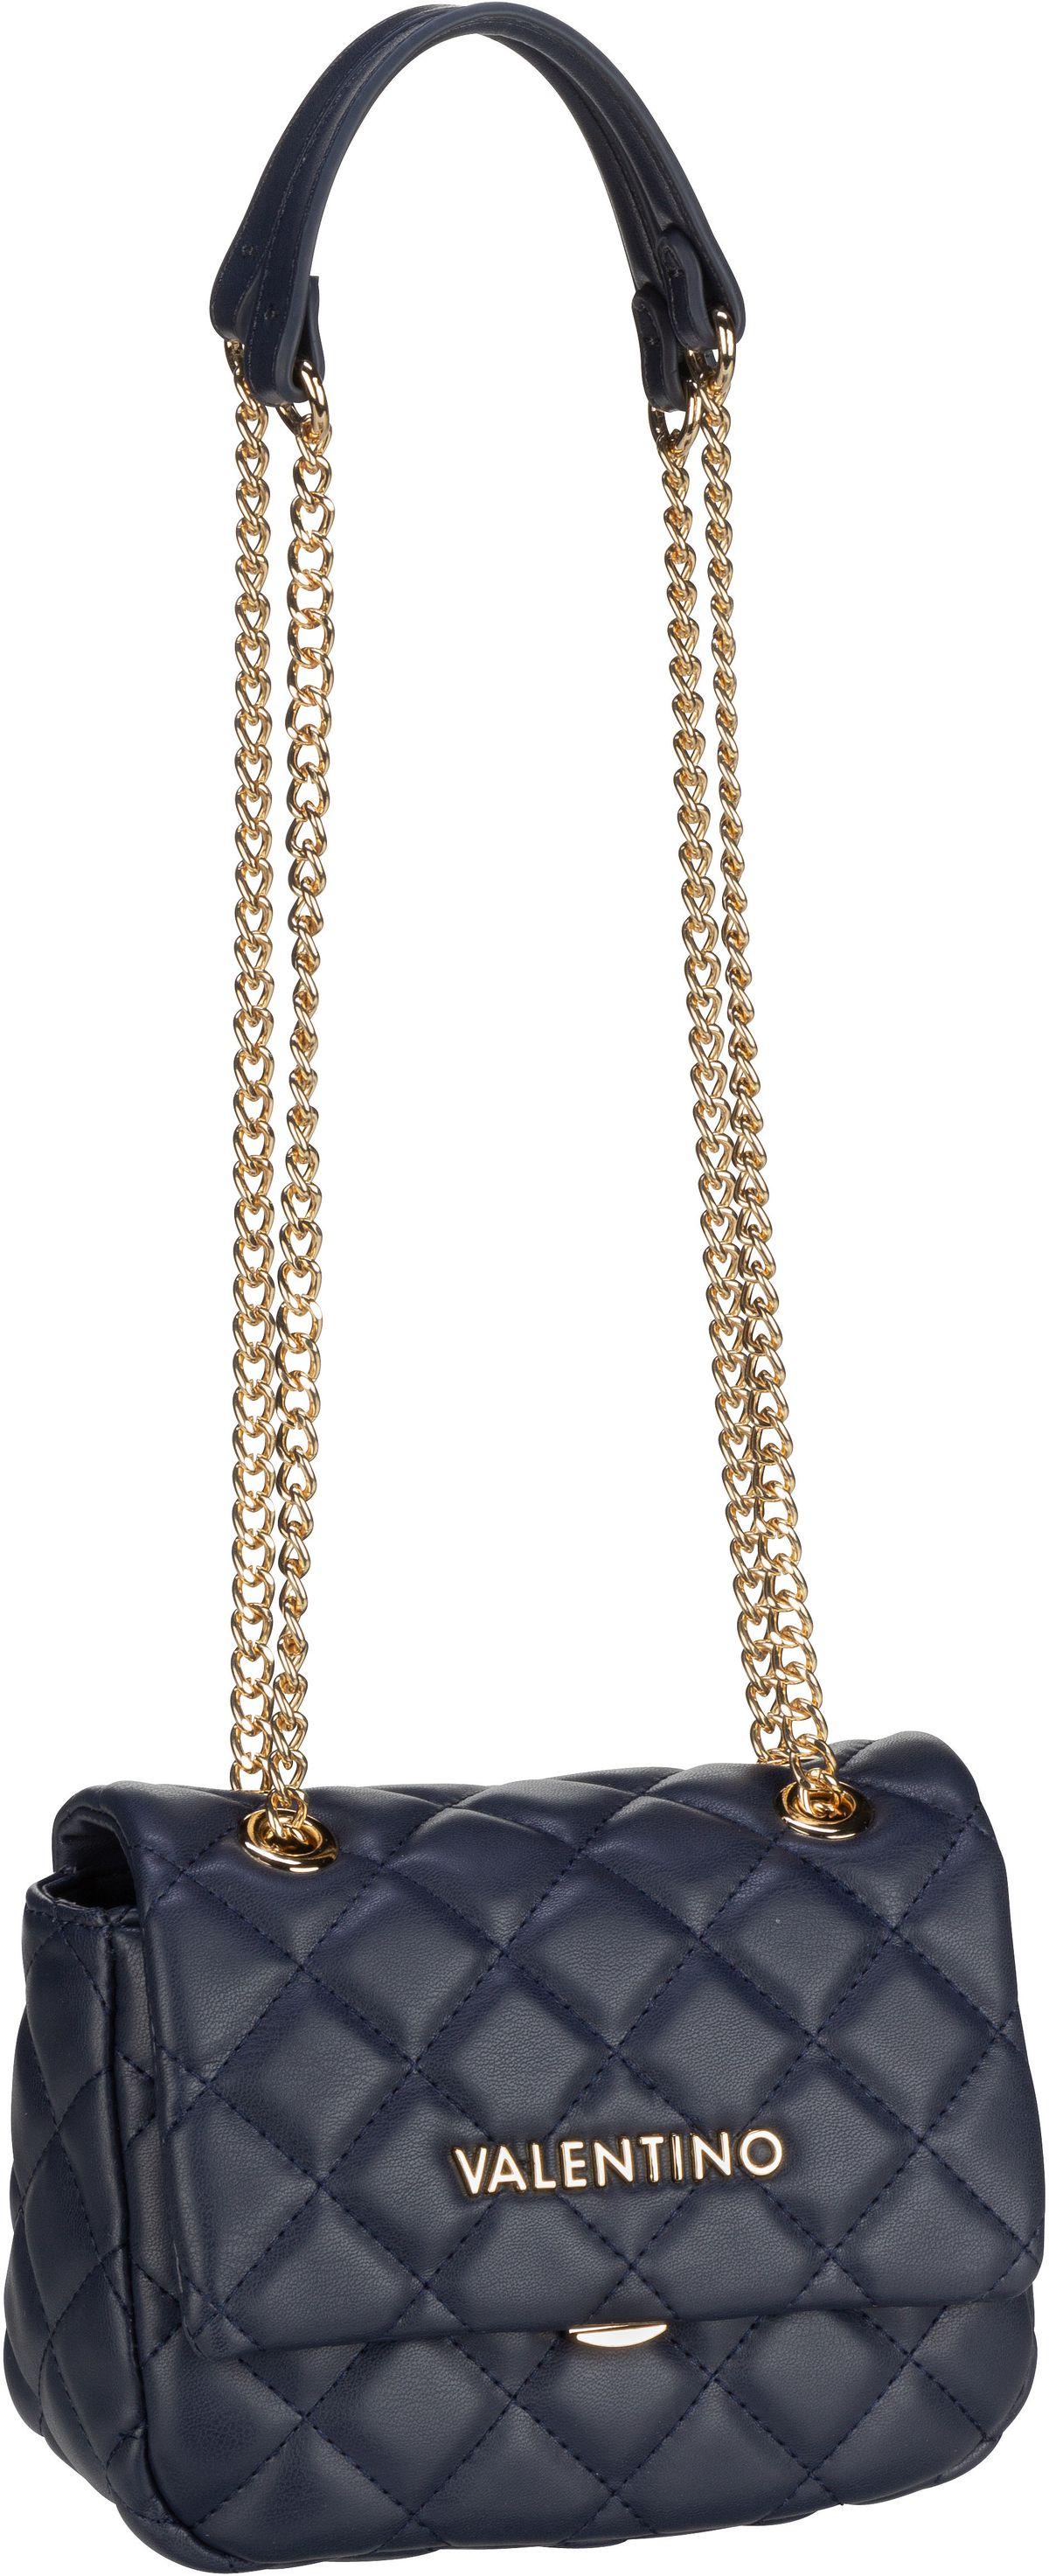 Bags Handtasche Ocarina Pattina K05 Blu